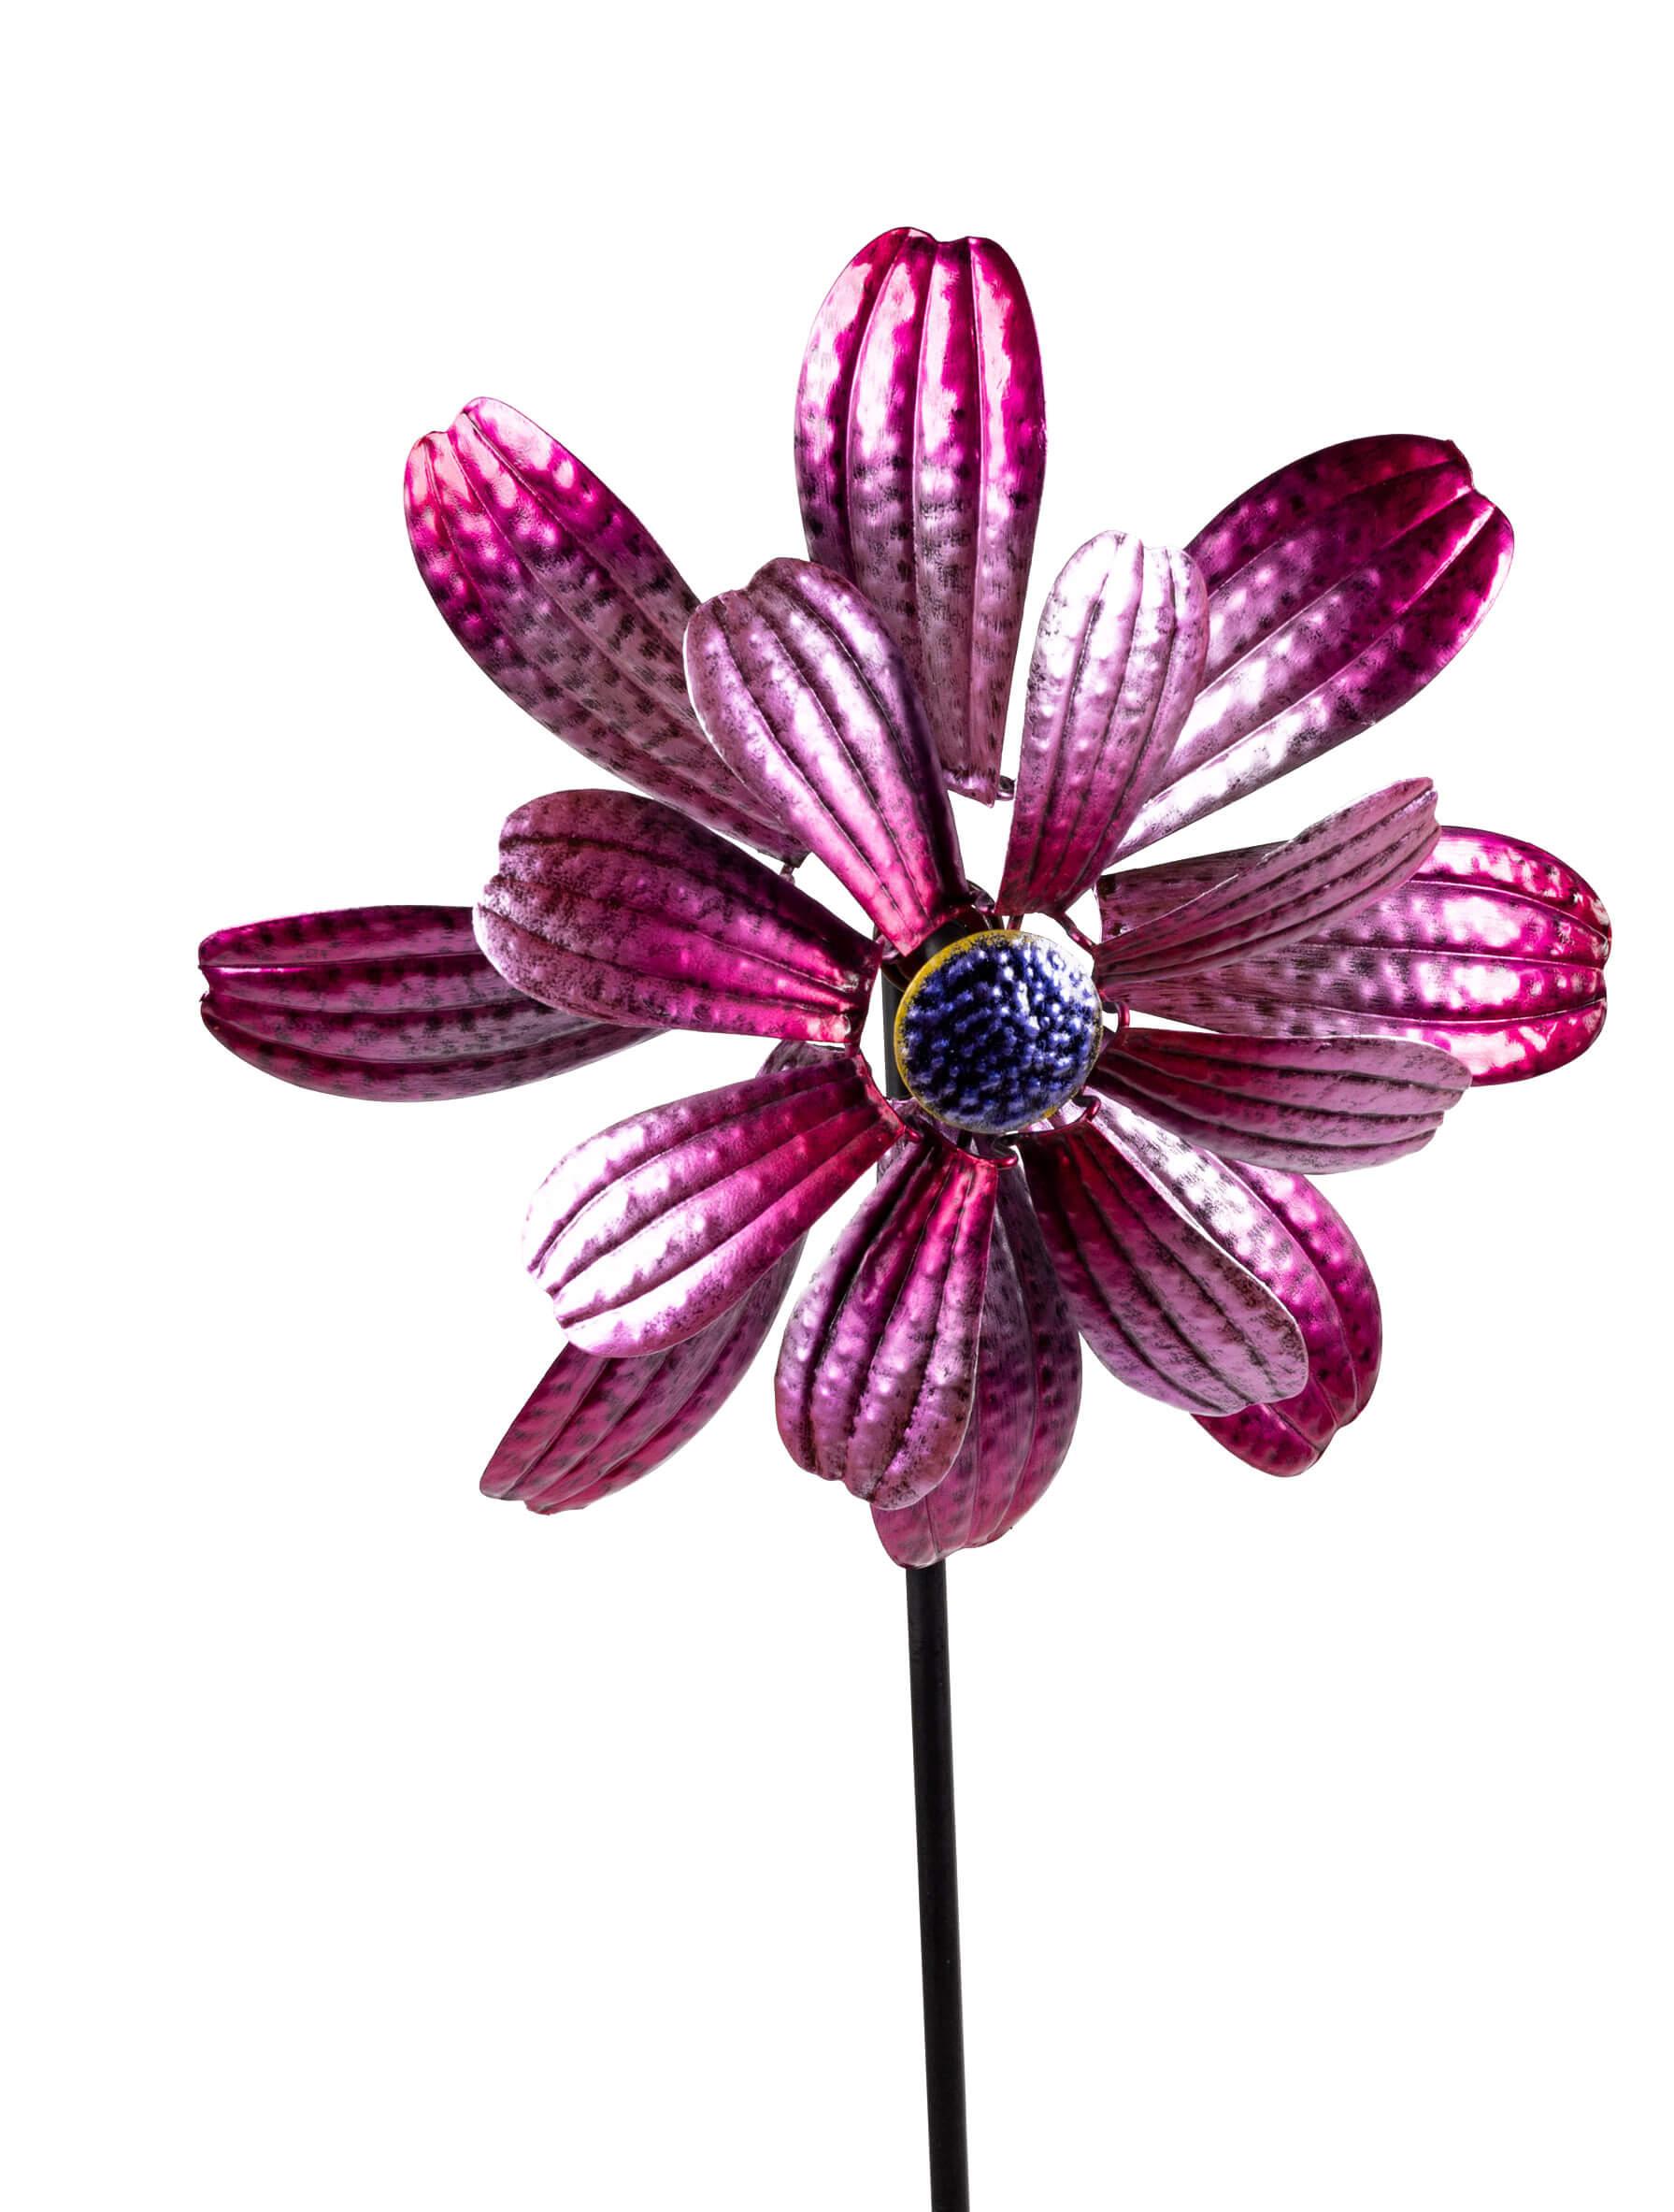 Windrad ZARTE Blume Windspiel 134 cm, Pink, Rosa Metall Blume, Gartenstecker